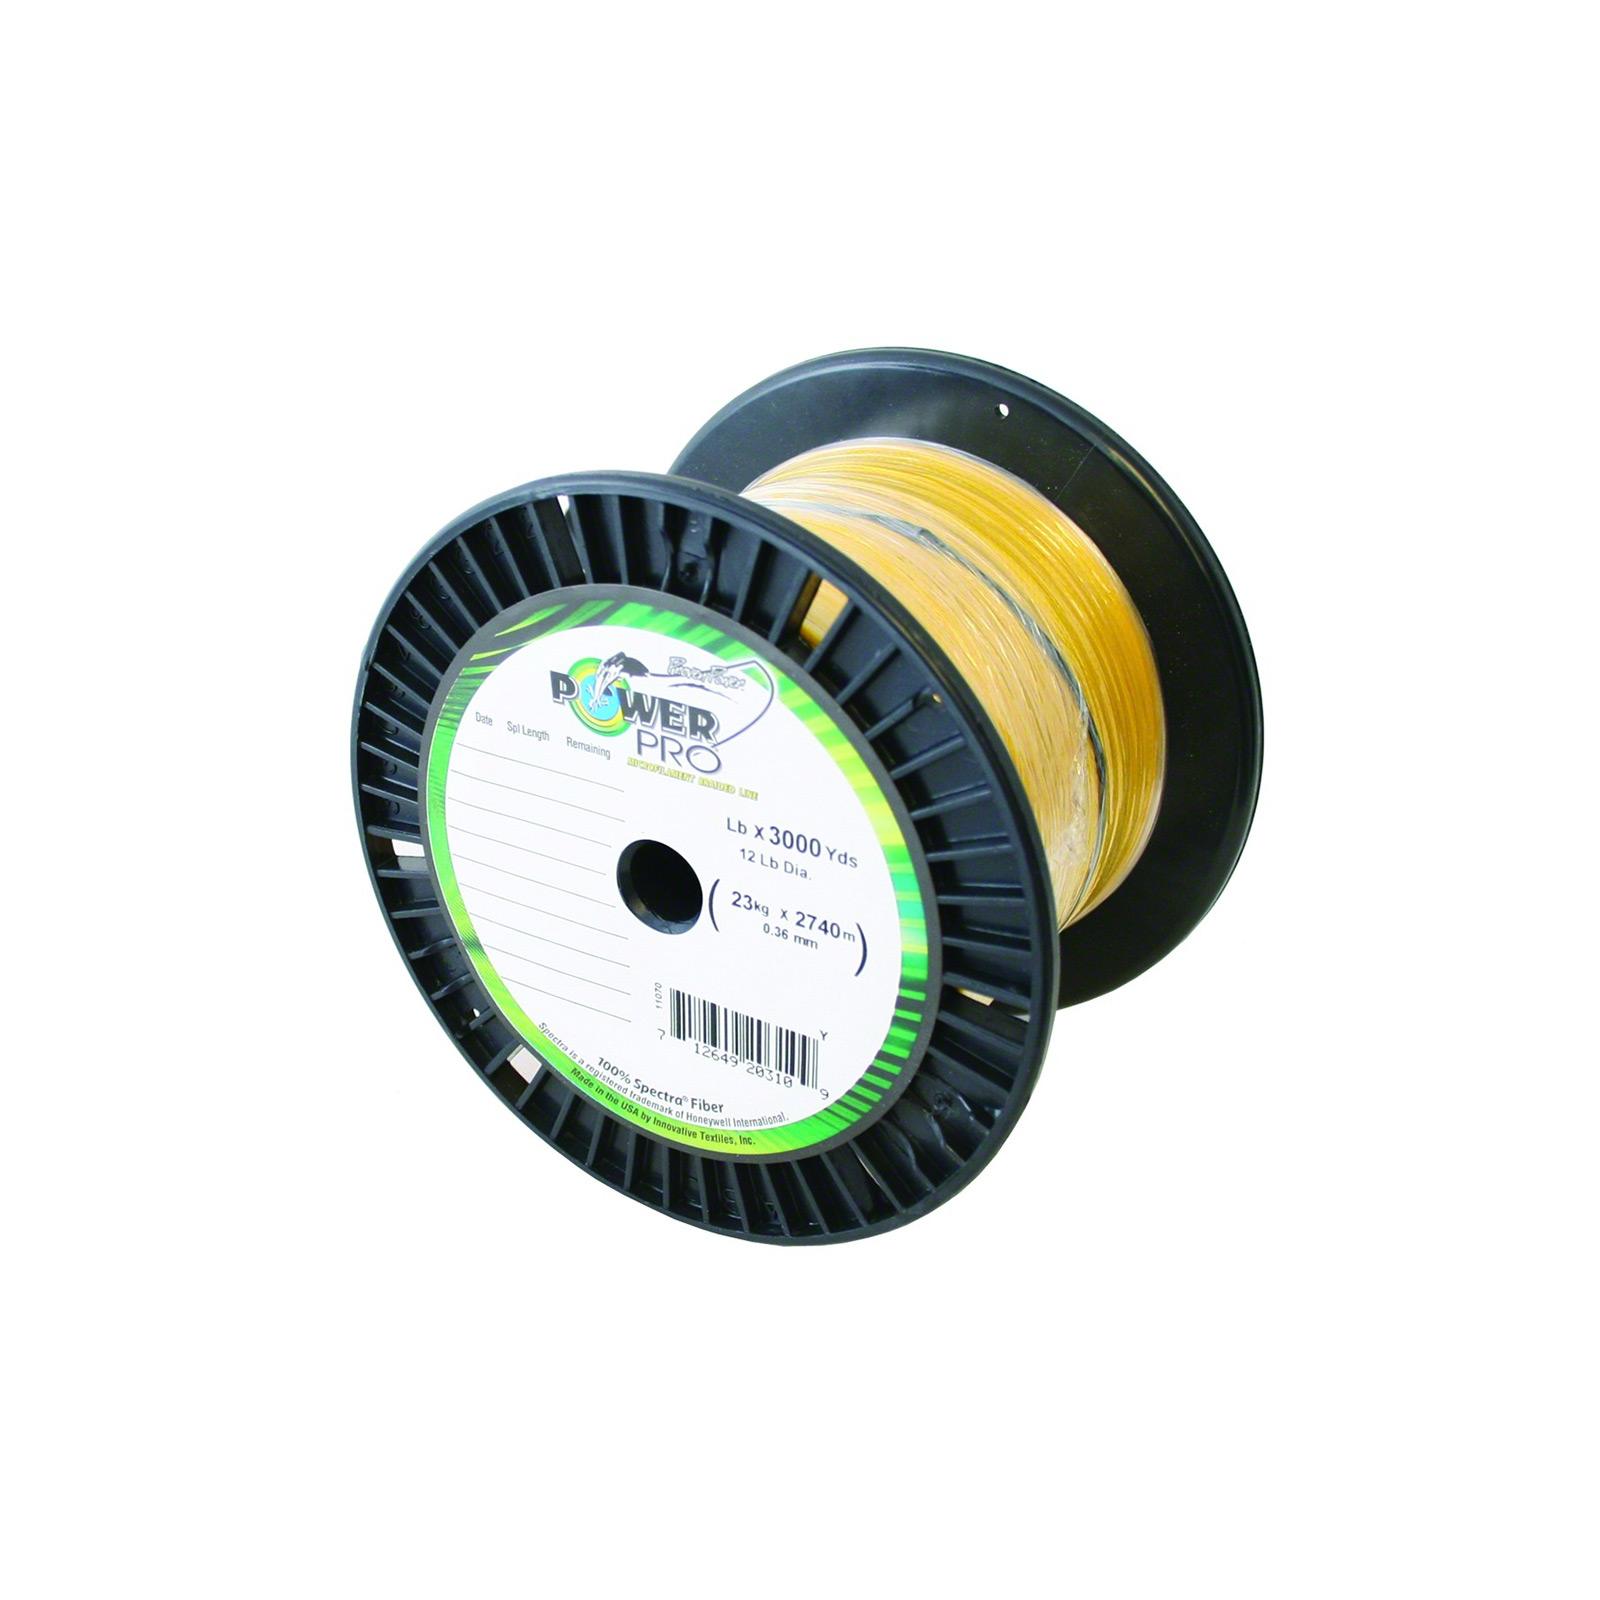 Power Pro Spectra 30lb 3000yds Hi-Vis Yel Braid, 30-3000-Y